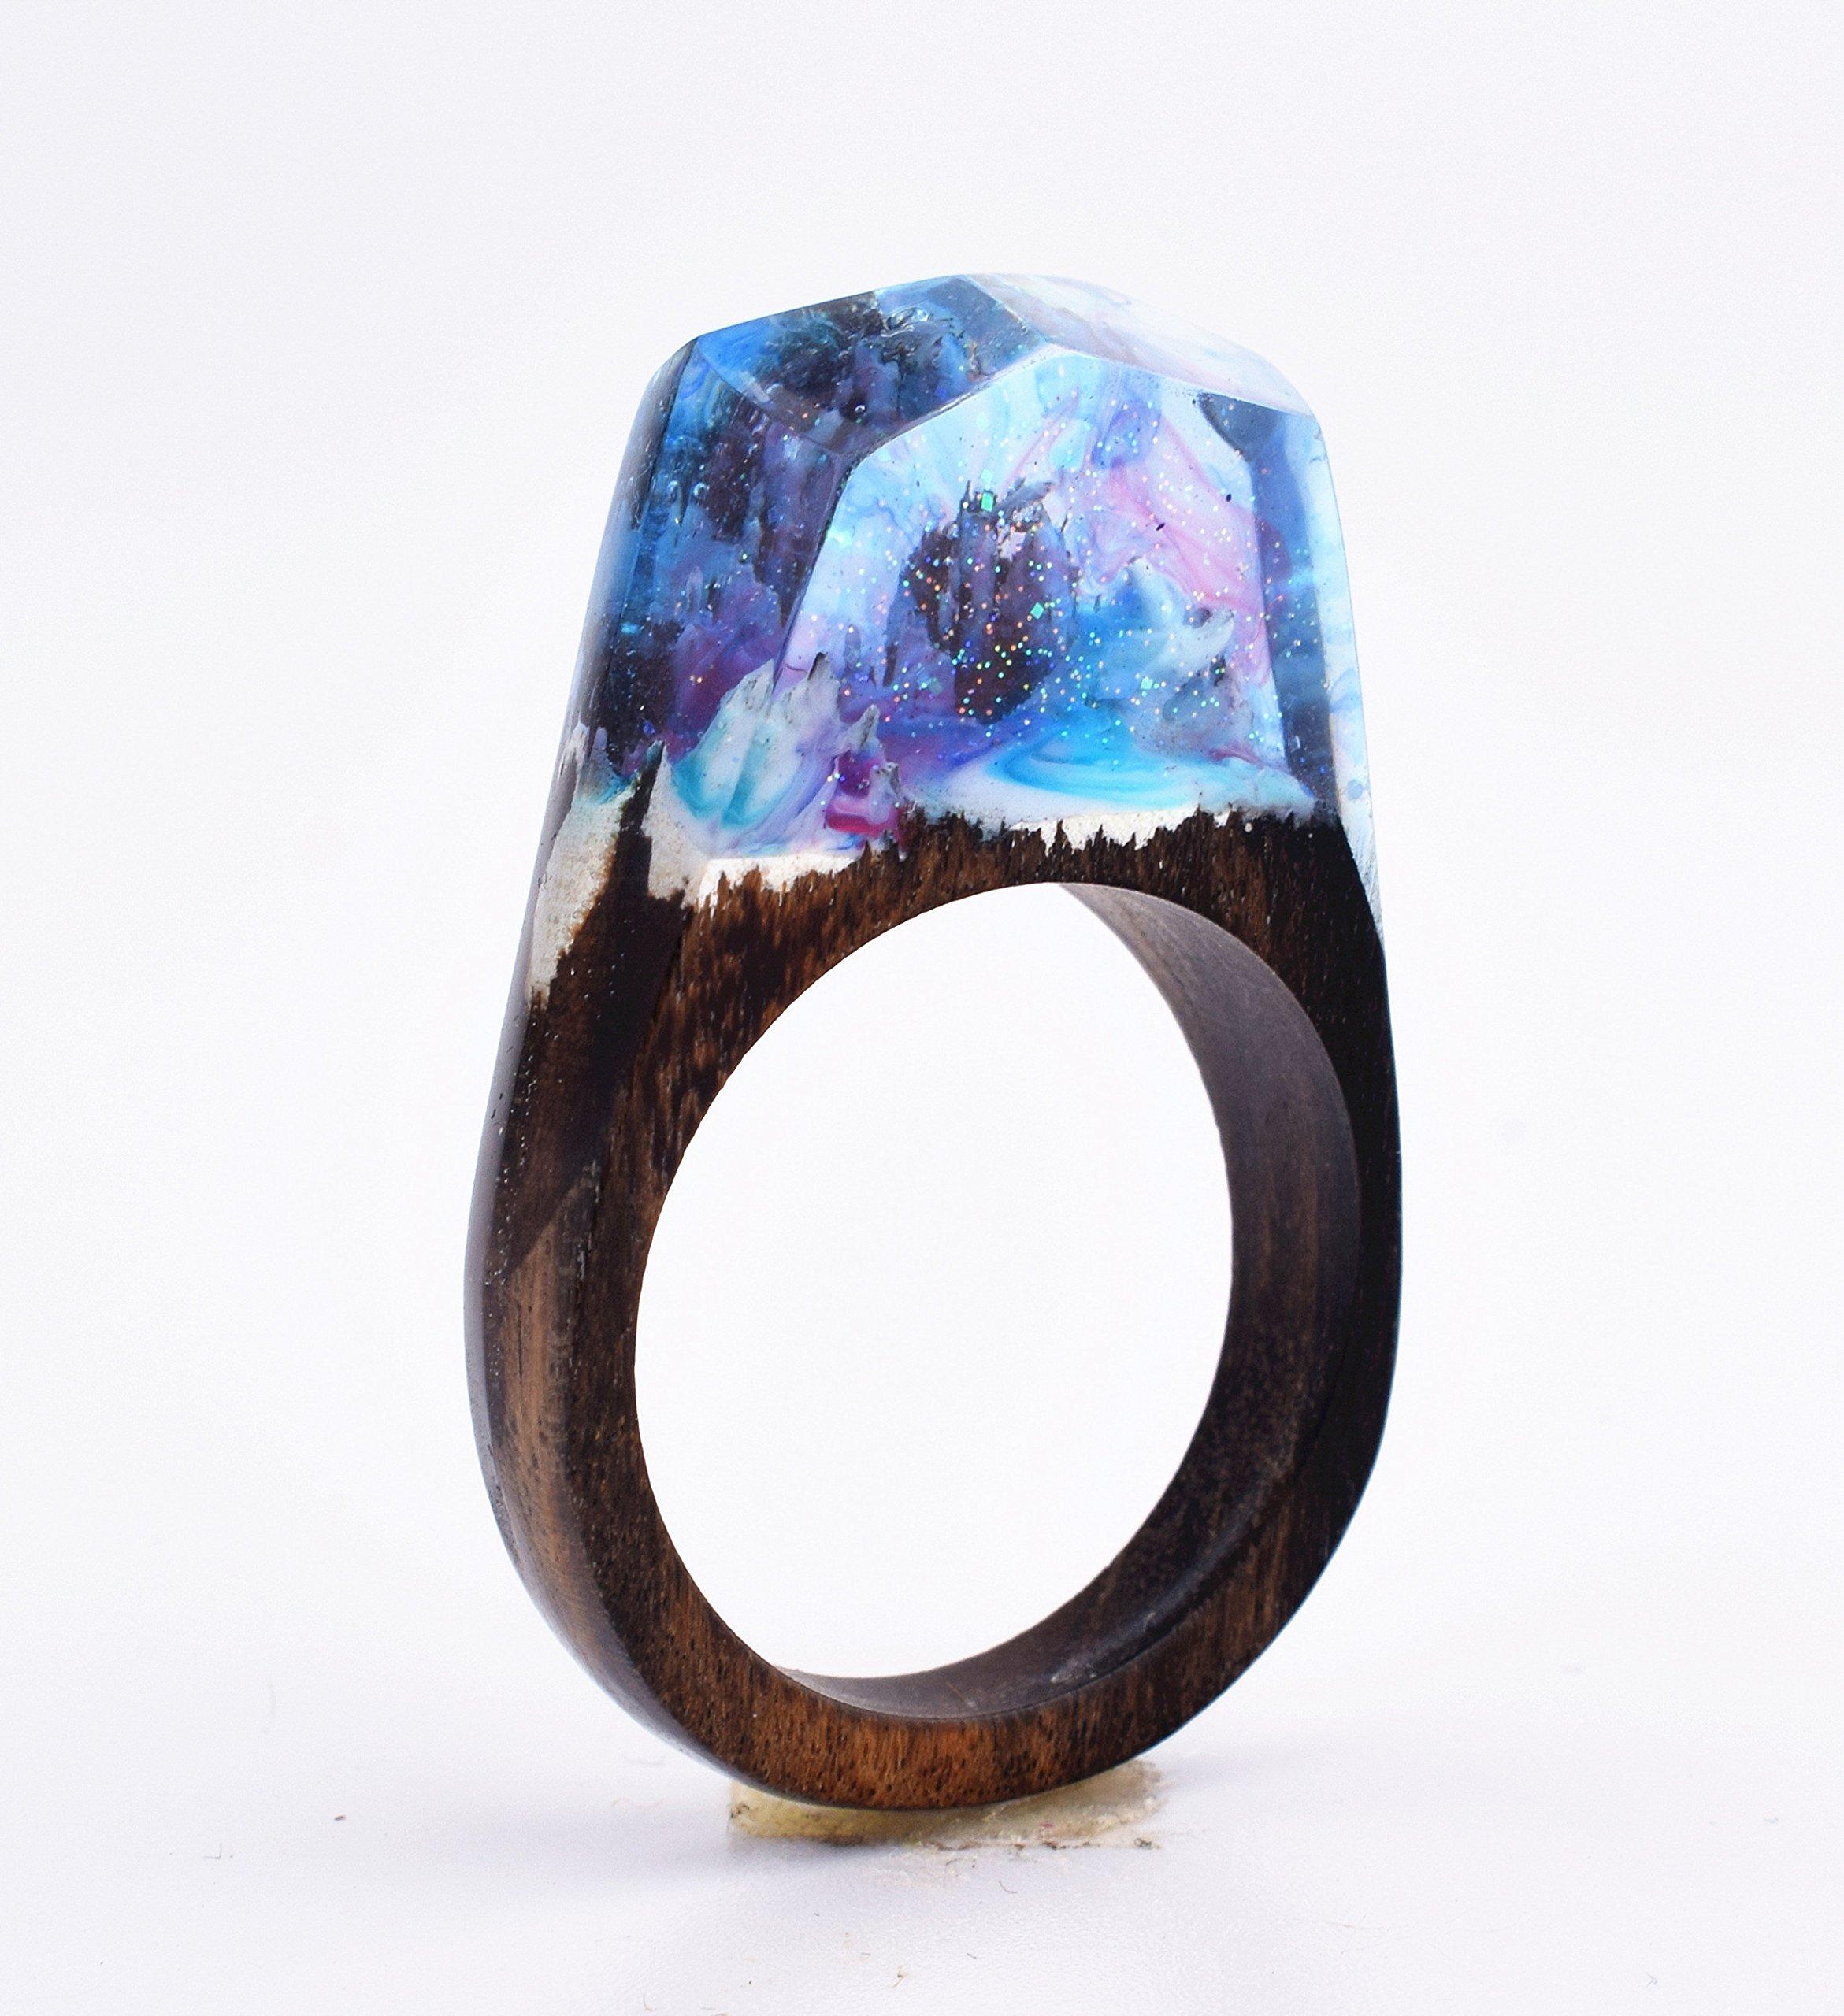 Heyou Love Handmade Wood Resin Ring With Secret Sky Landscape Inside Jewelry by Heyou Love (Image #2)